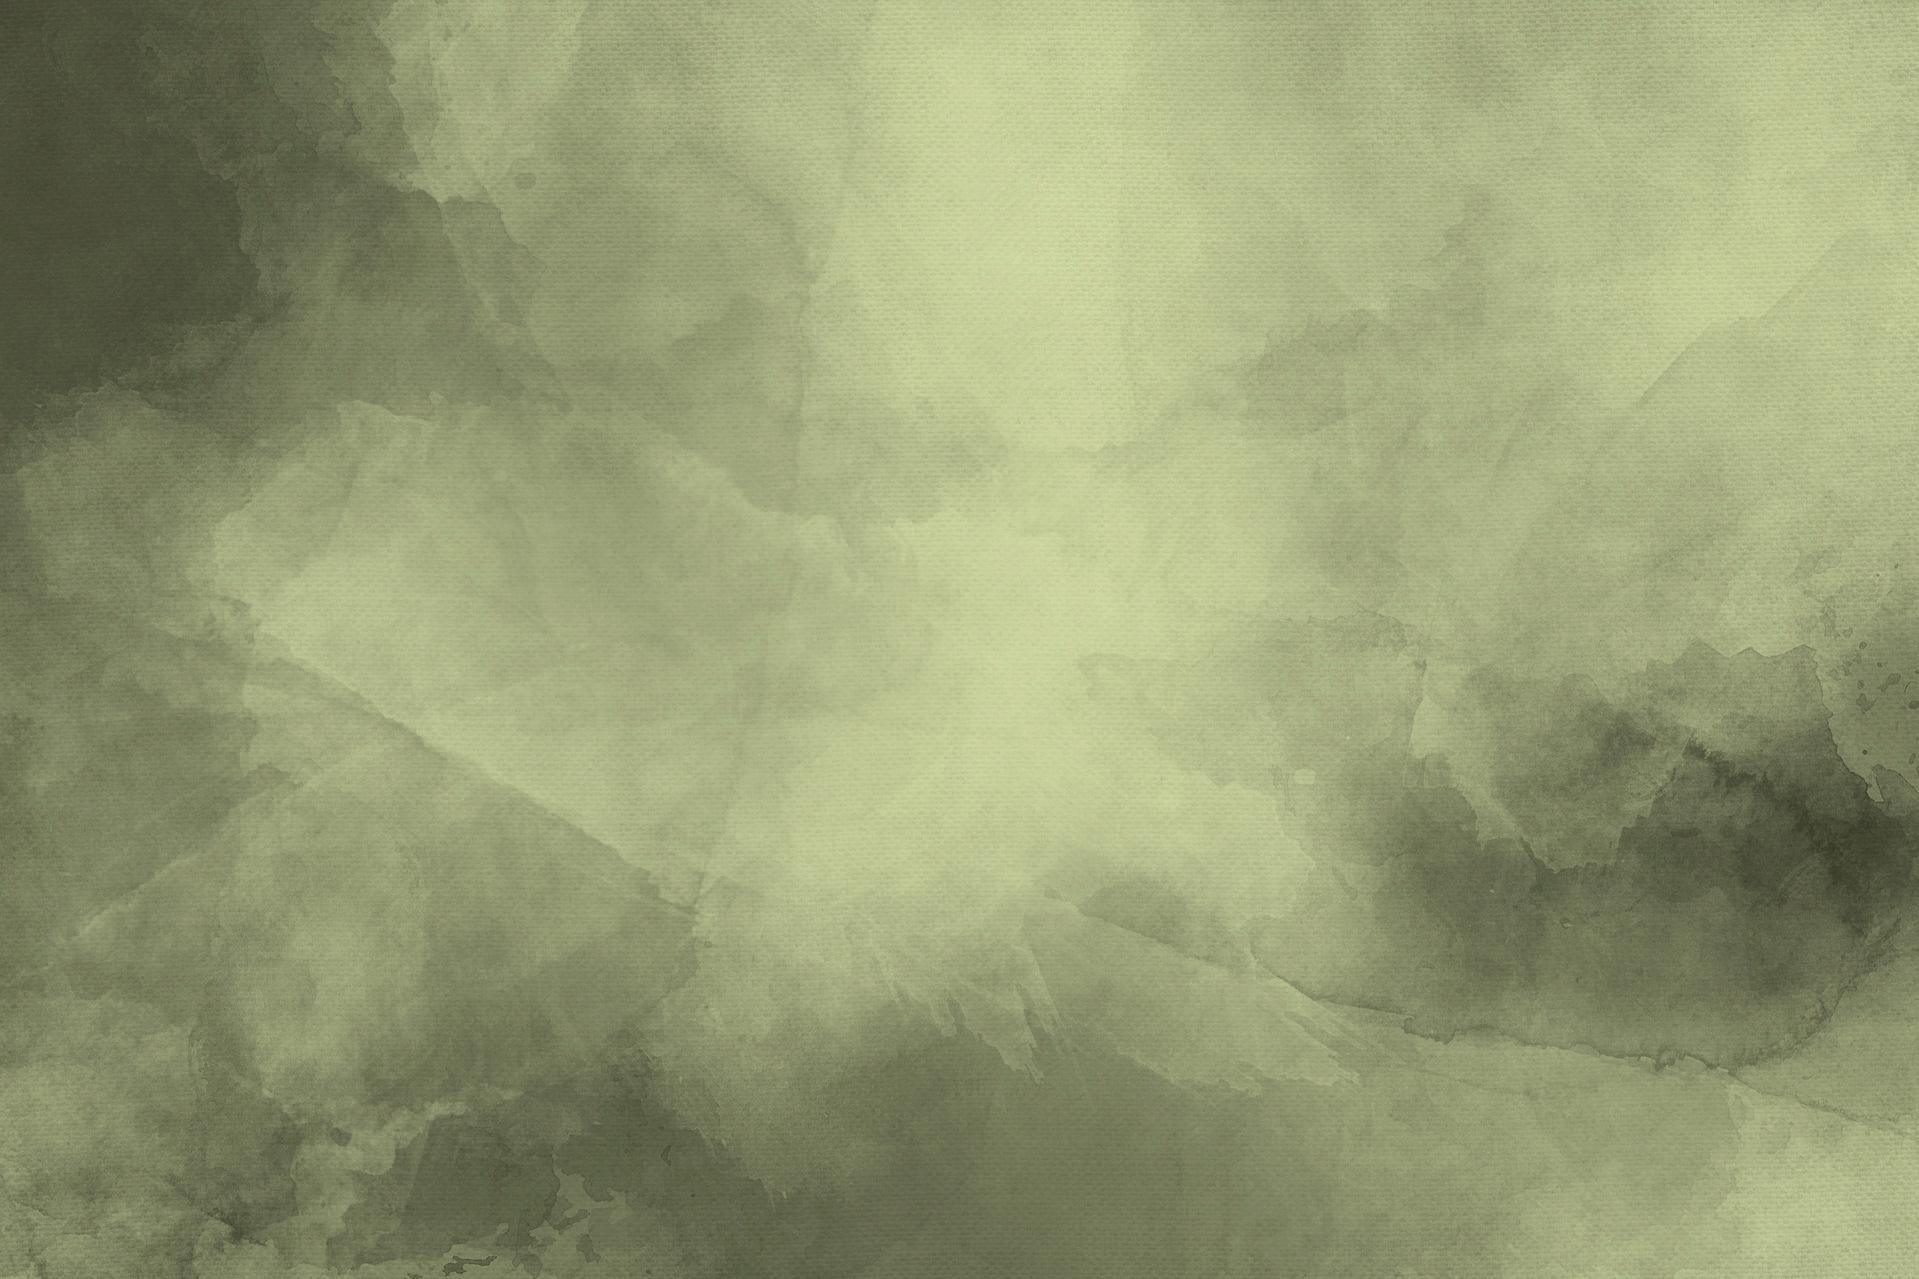 painting-2407262_1920.jpg